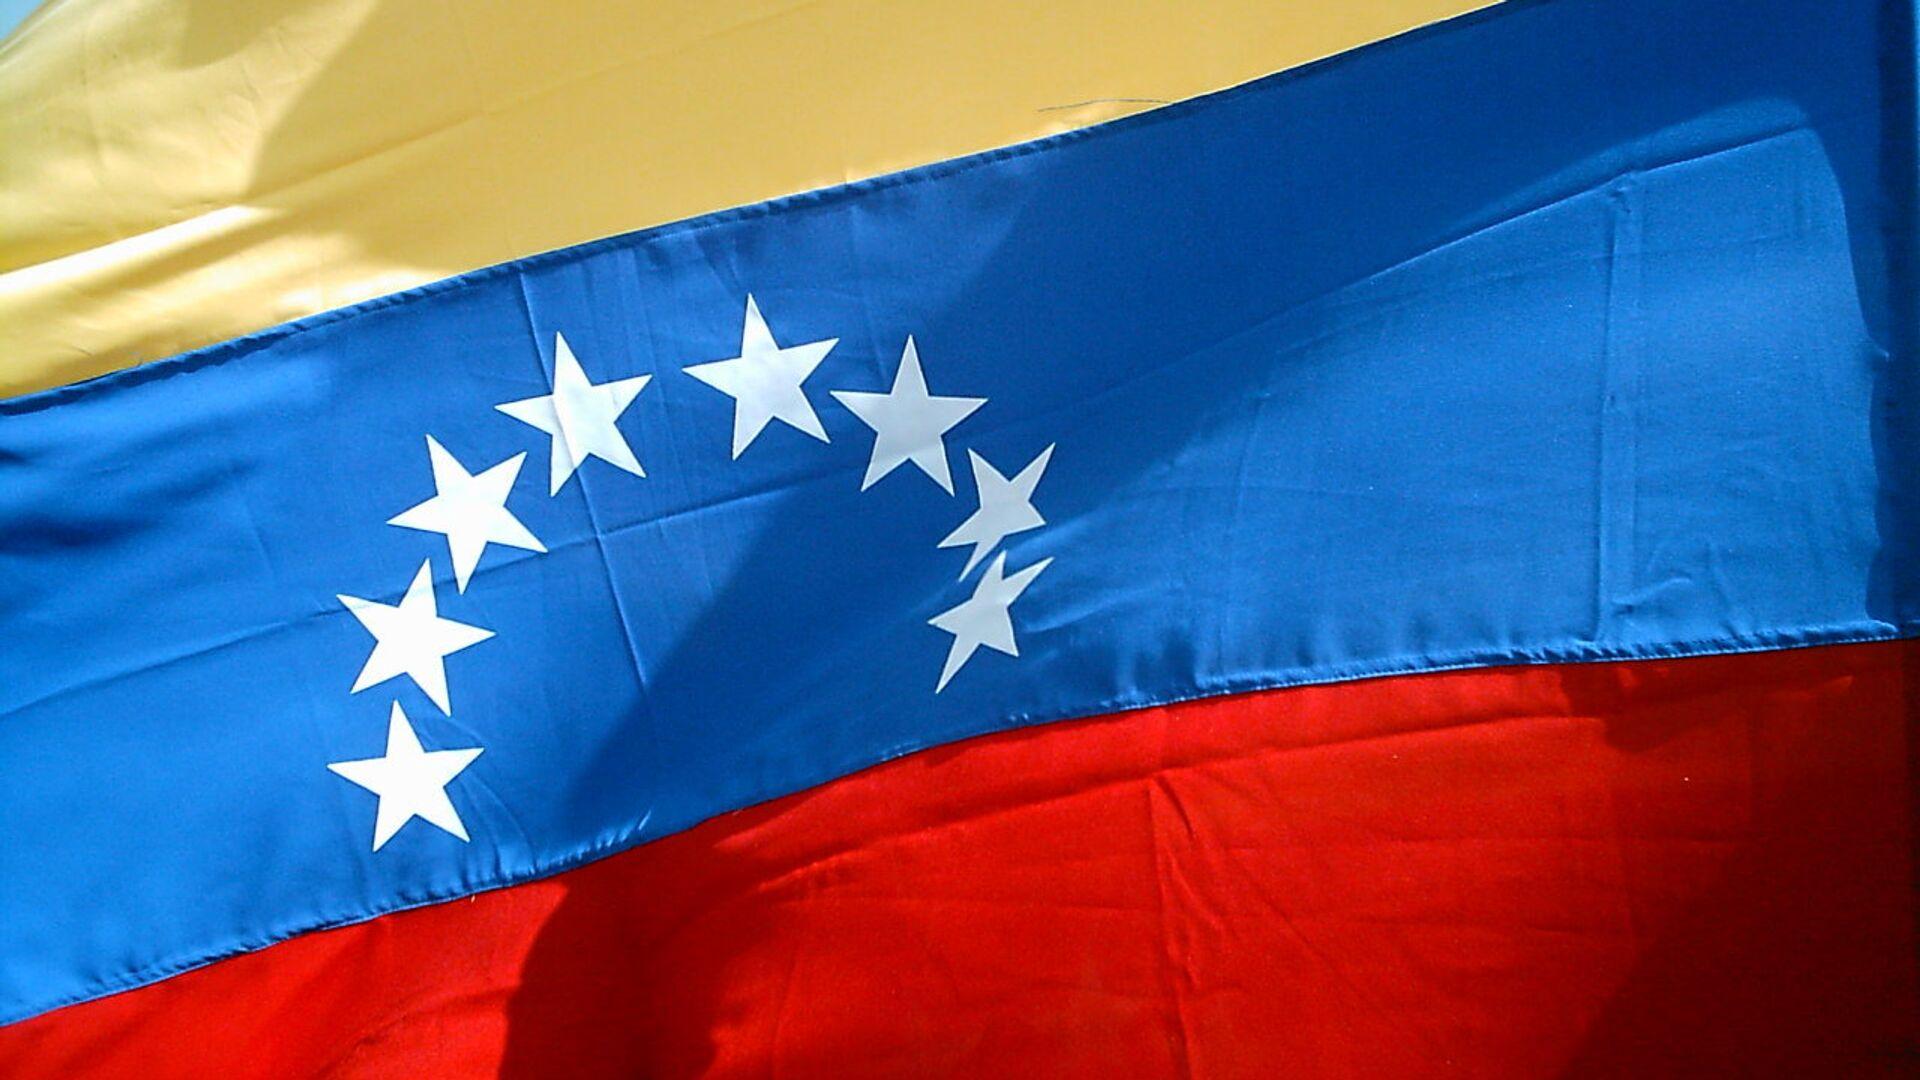 Bandera de Venezuela - Sputnik Mundo, 1920, 15.08.2021